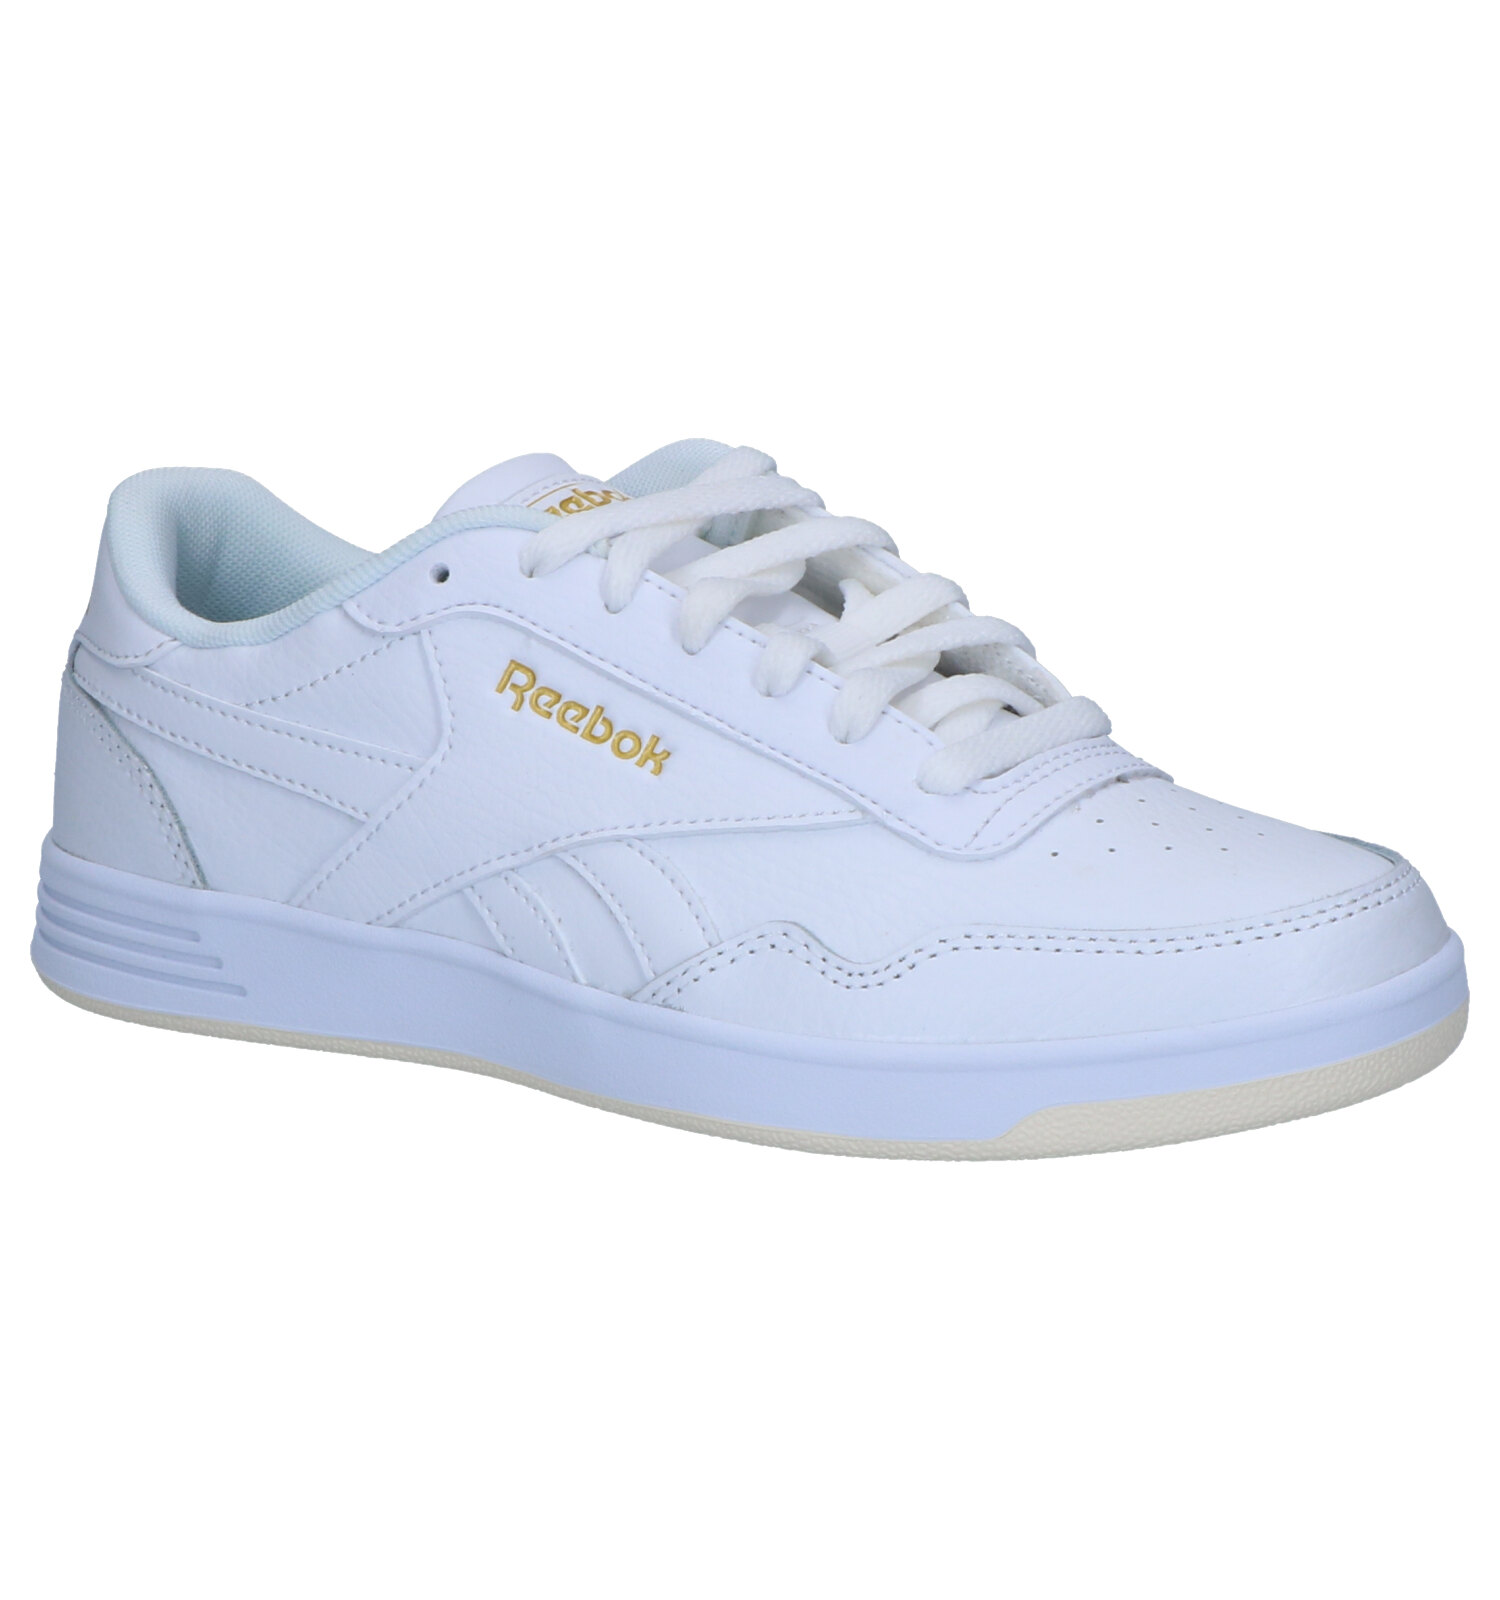 Reebok Royal Techqu Witte Sneakers | TORFS.BE | Gratis verzend en retour